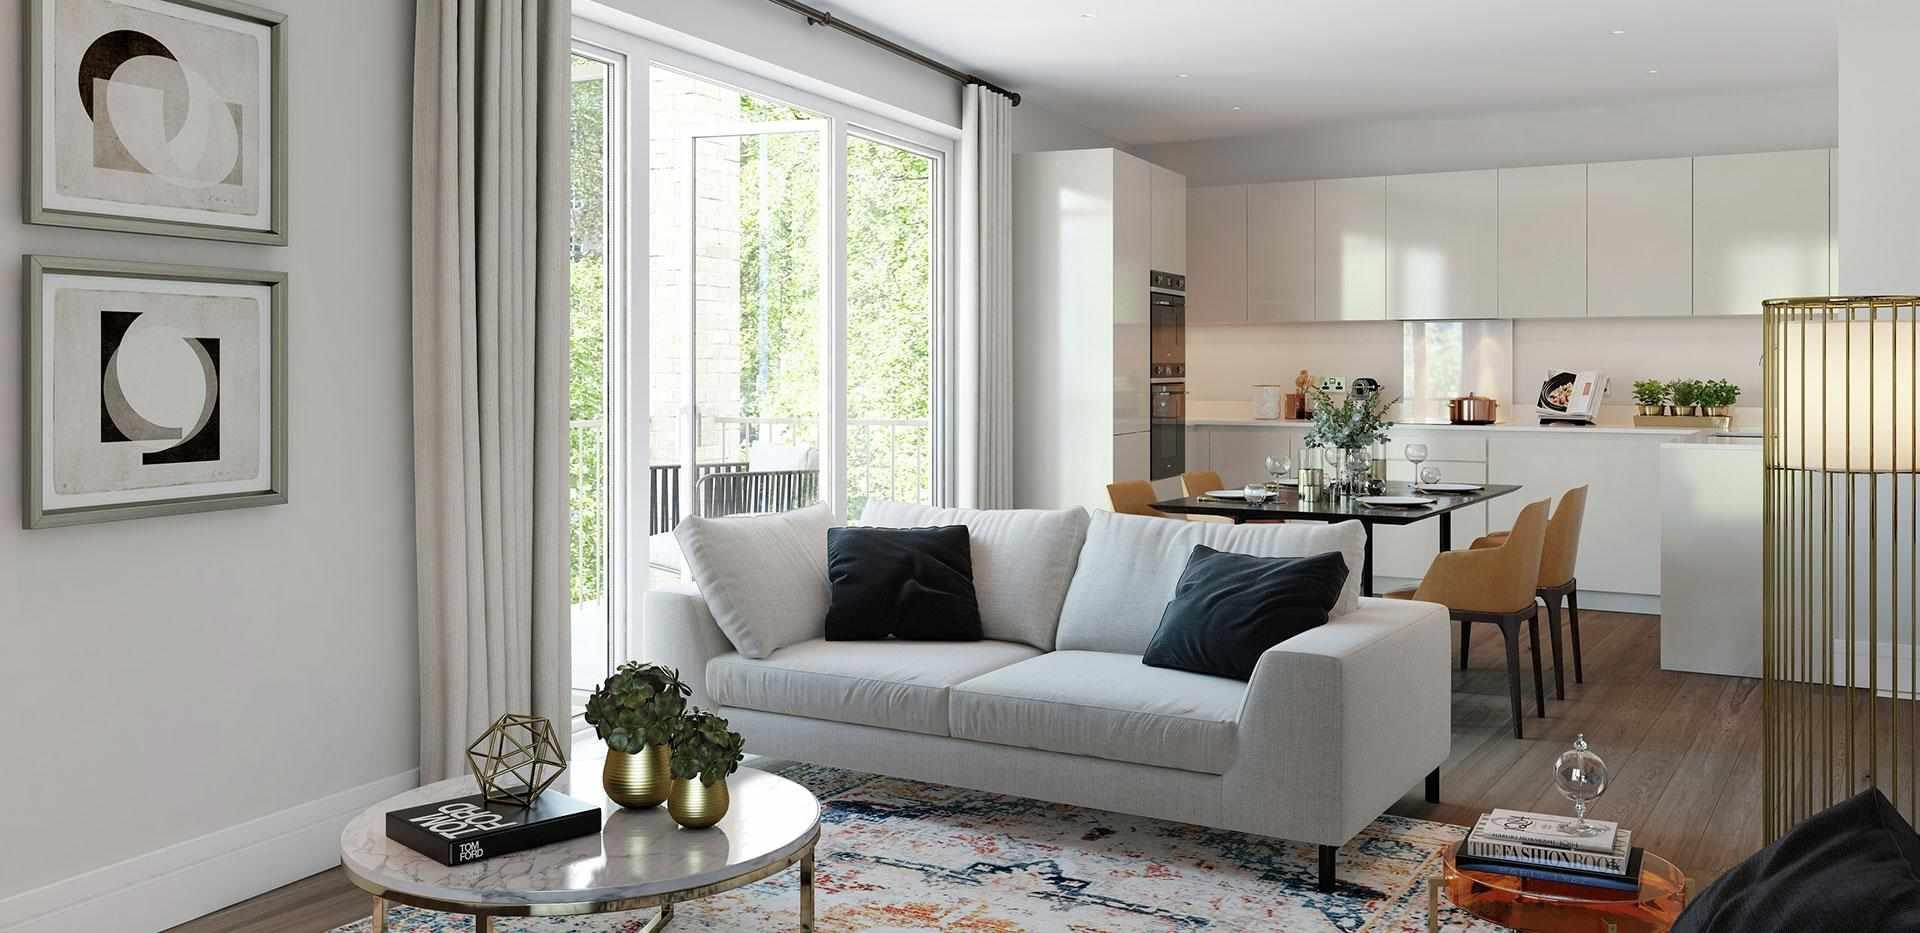 Forbury Apartments - CGI - 3.jpeg